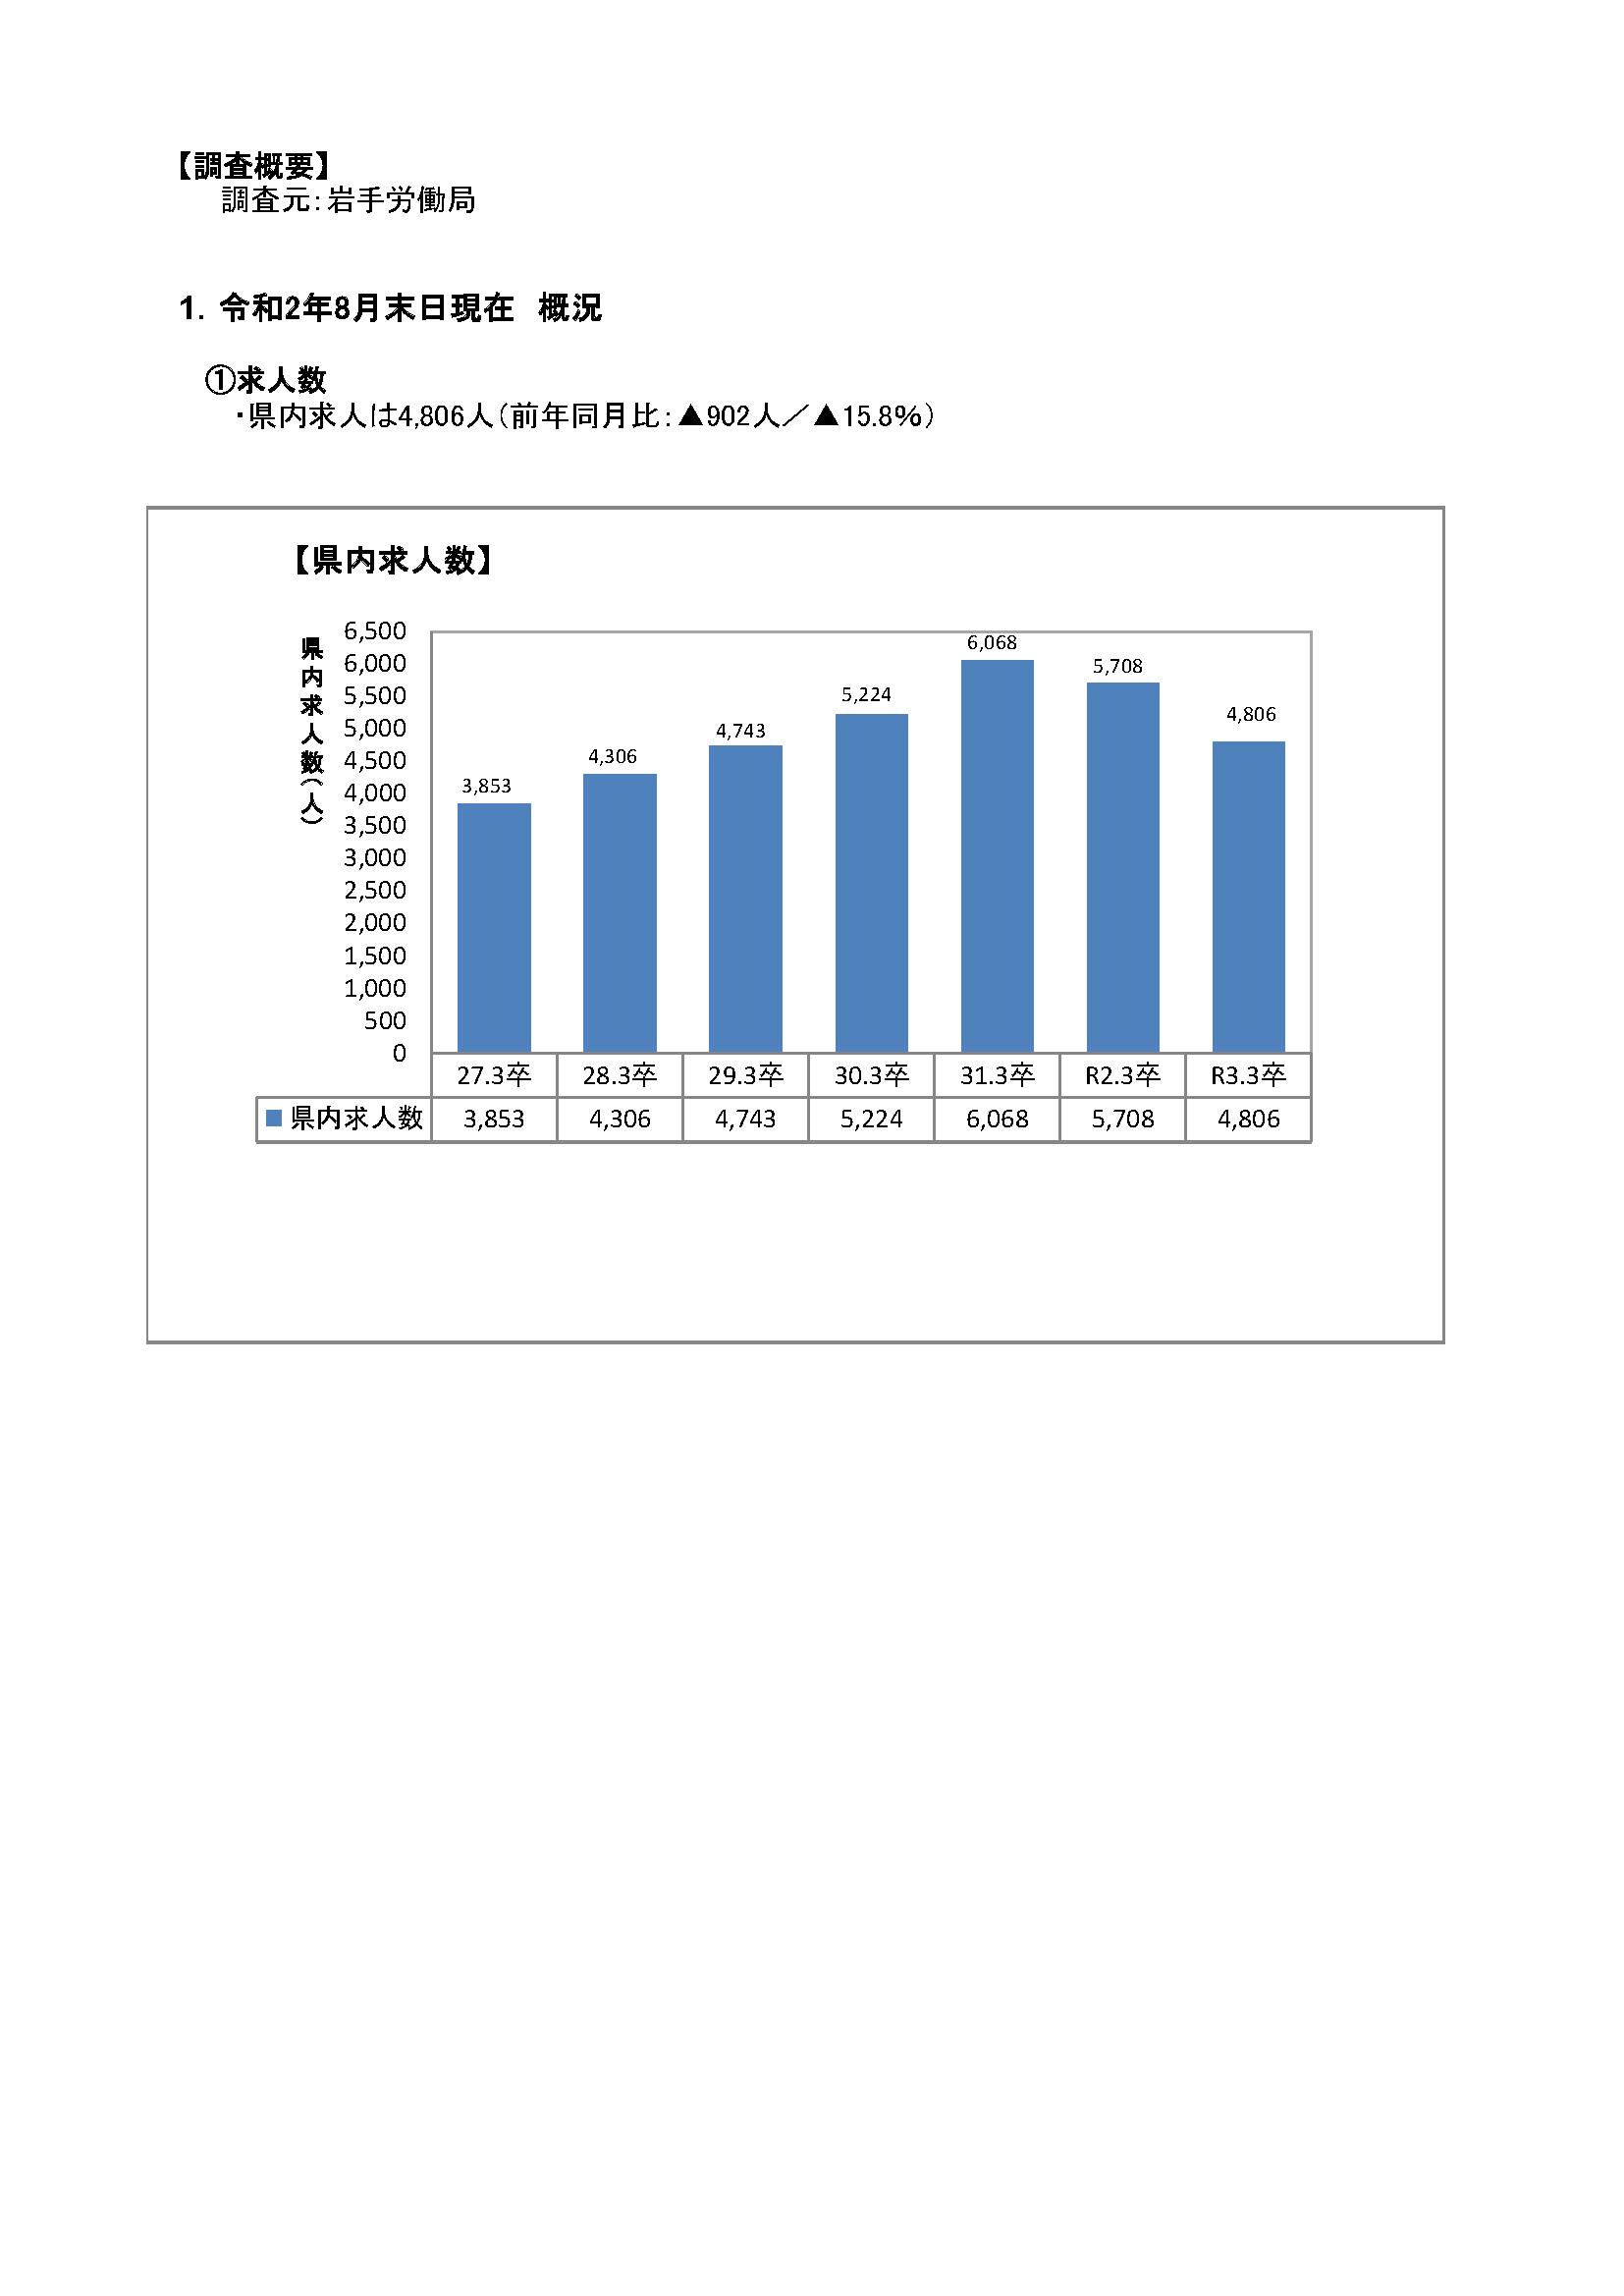 R3.3月高卒者職業紹介状況資料(202008月末現在)